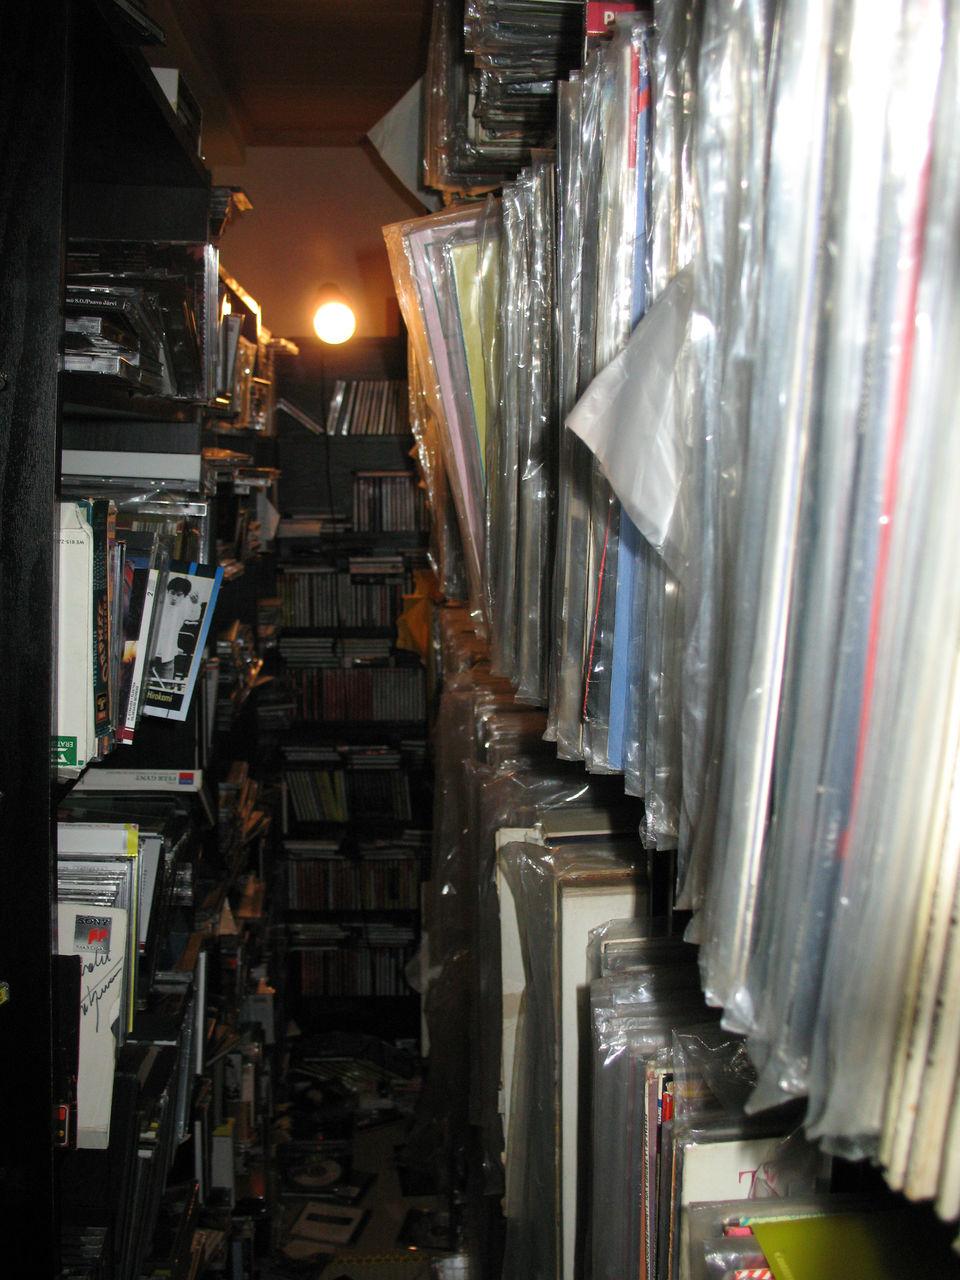 X JAPAN THREAD SHOCK #1033 [無断転載禁止]©2ch.netYouTube動画>38本 ->画像>94枚